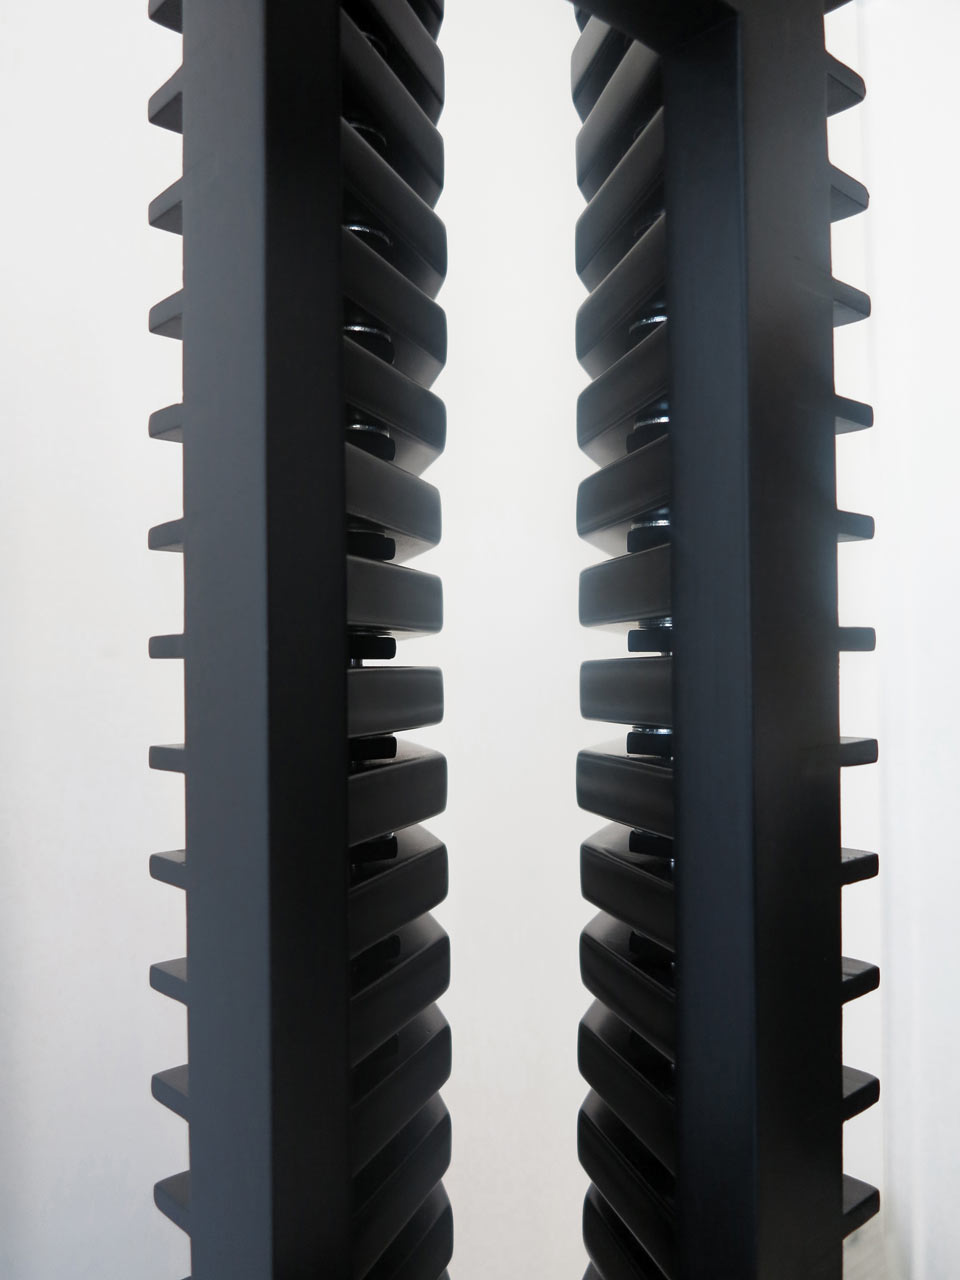 Samurai-Cabinet-Sebastian-Errazuriz-14